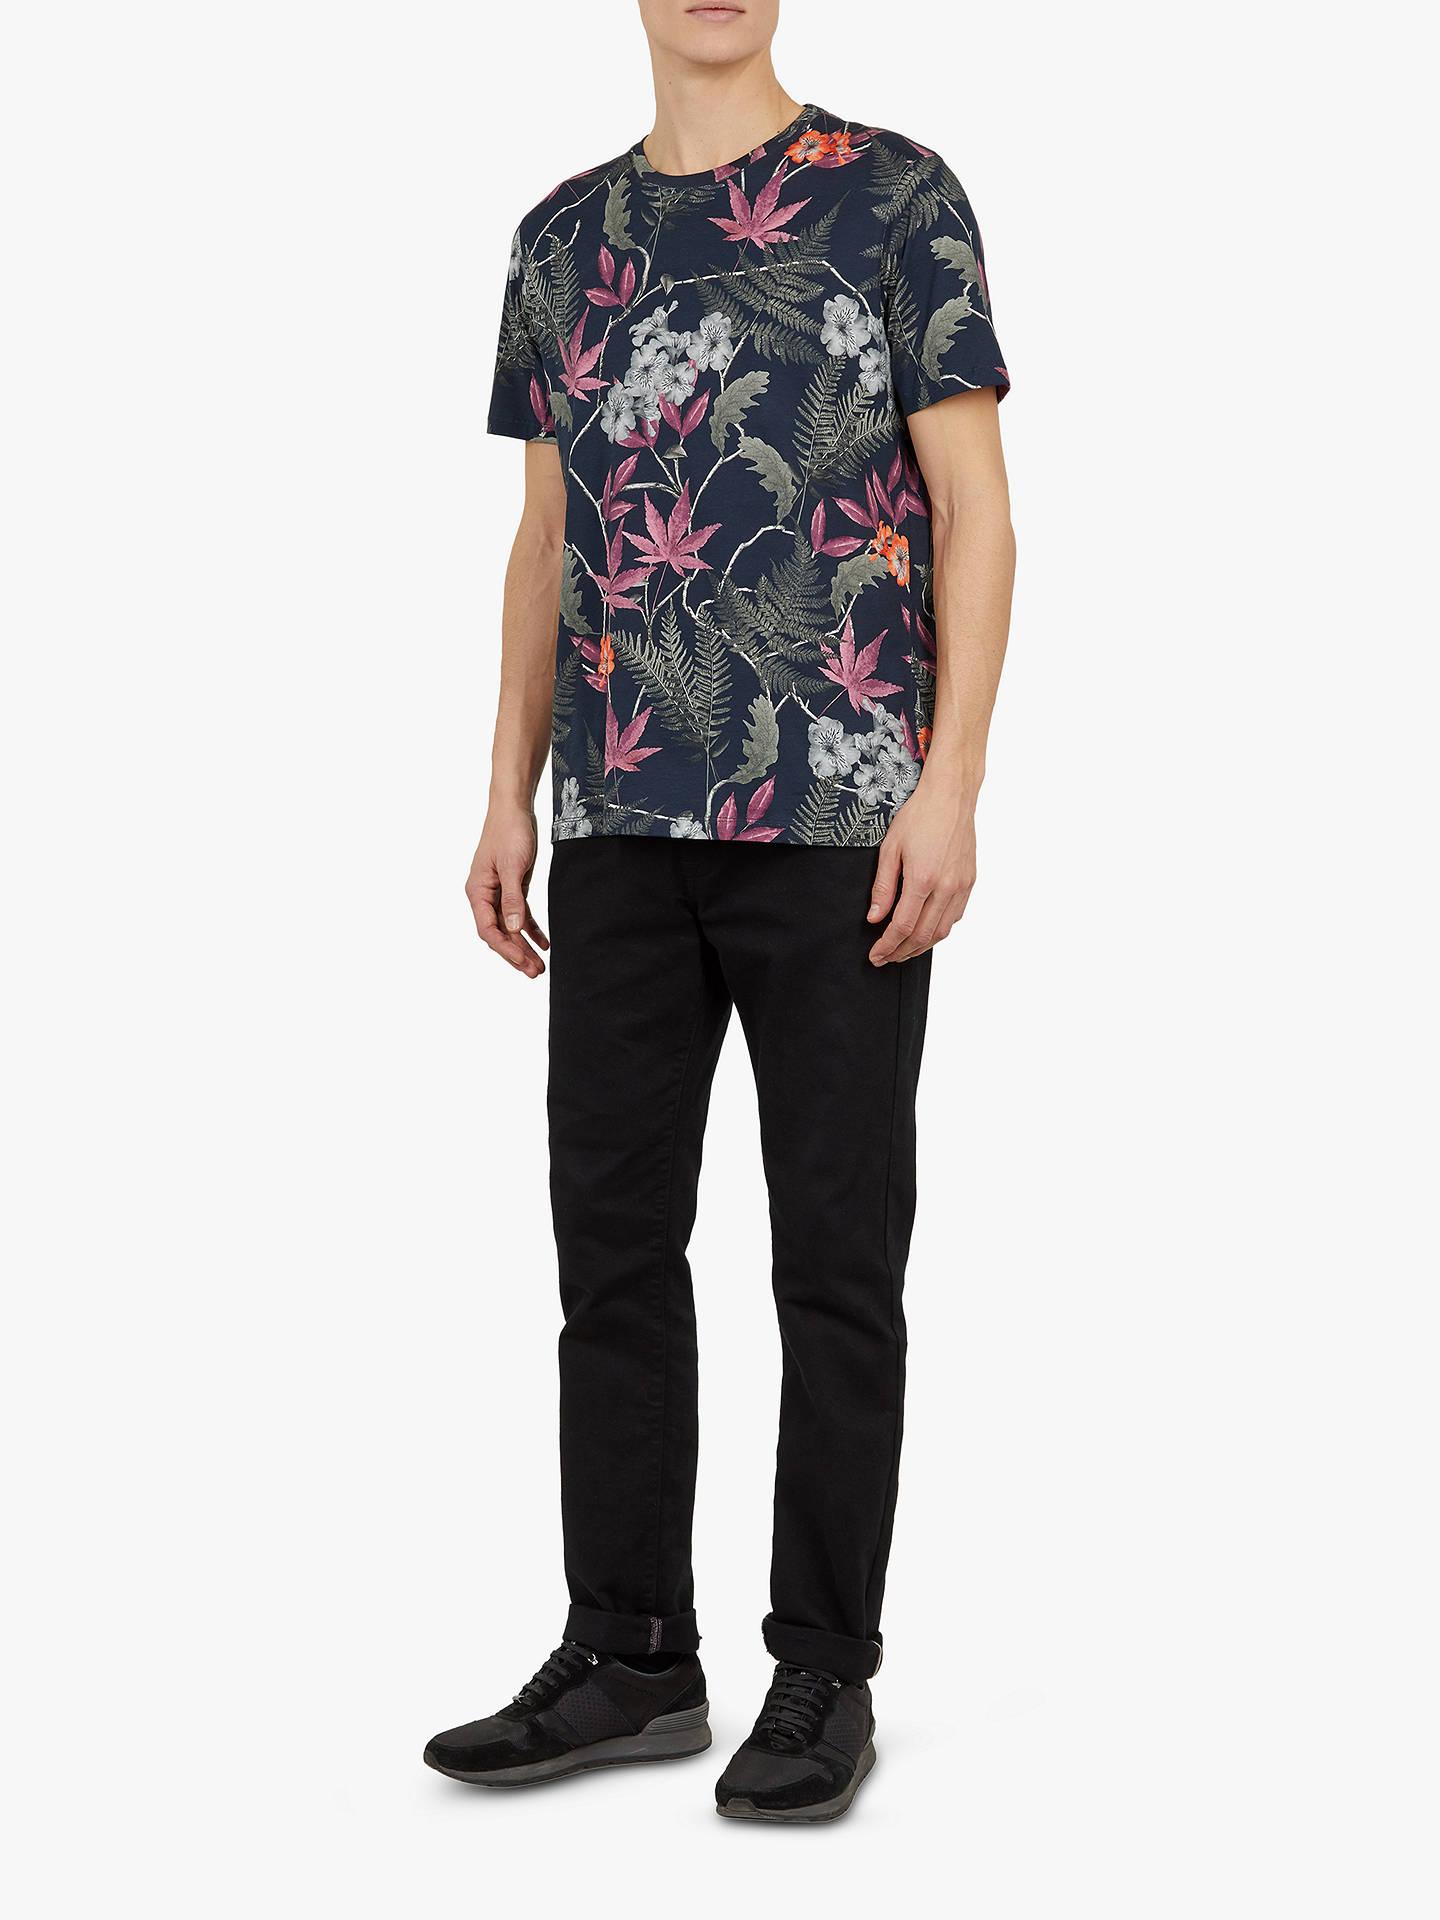 2b29808607fb Buy Ted Baker Buck Floral Printed T-Shirt